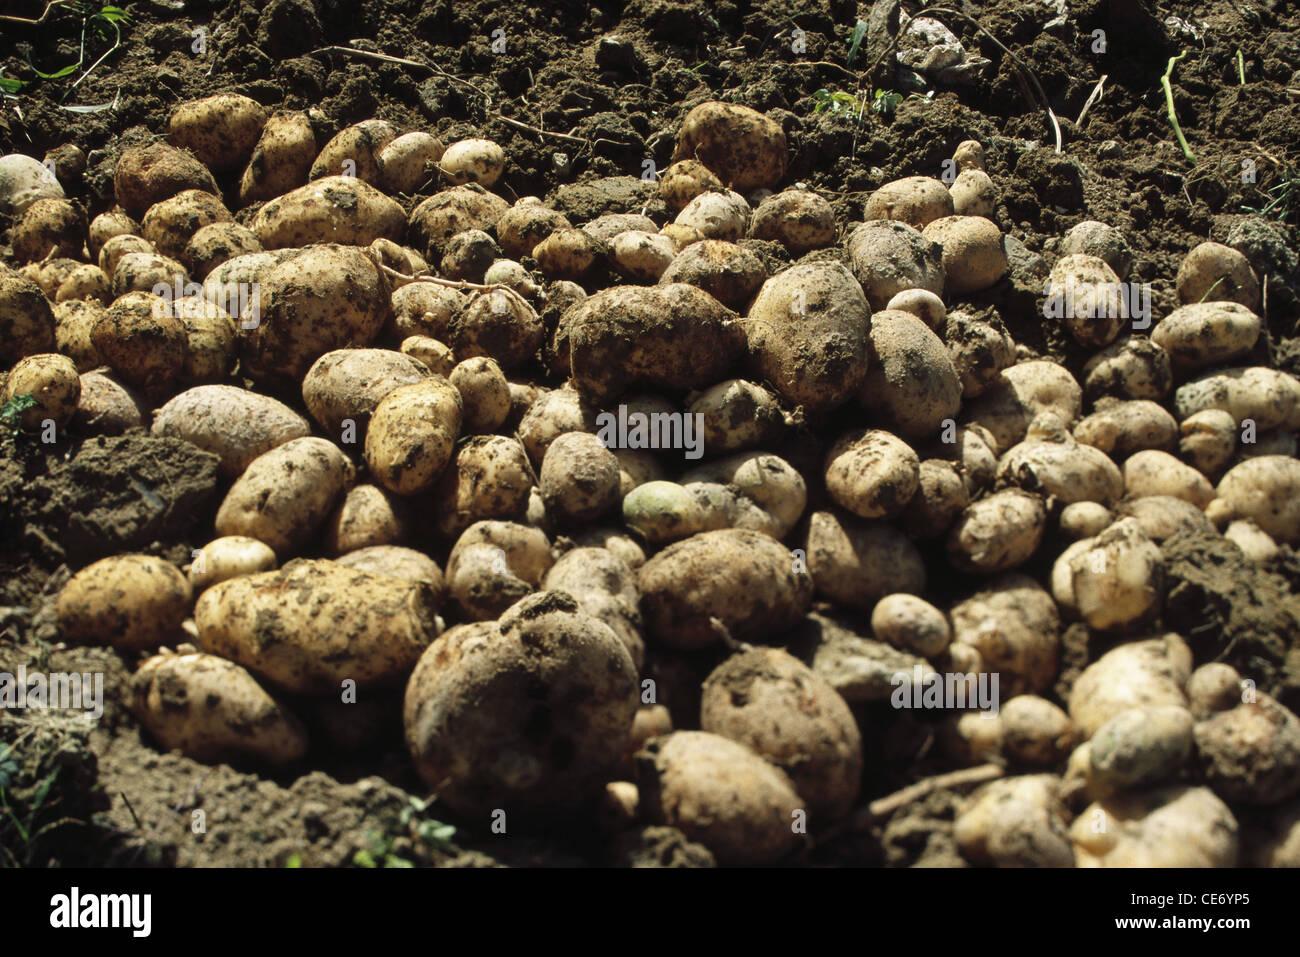 AAD 83814 : Vegetable potatoes ; bharmour ; chamba ; himachal pradesh ; india - Stock Image